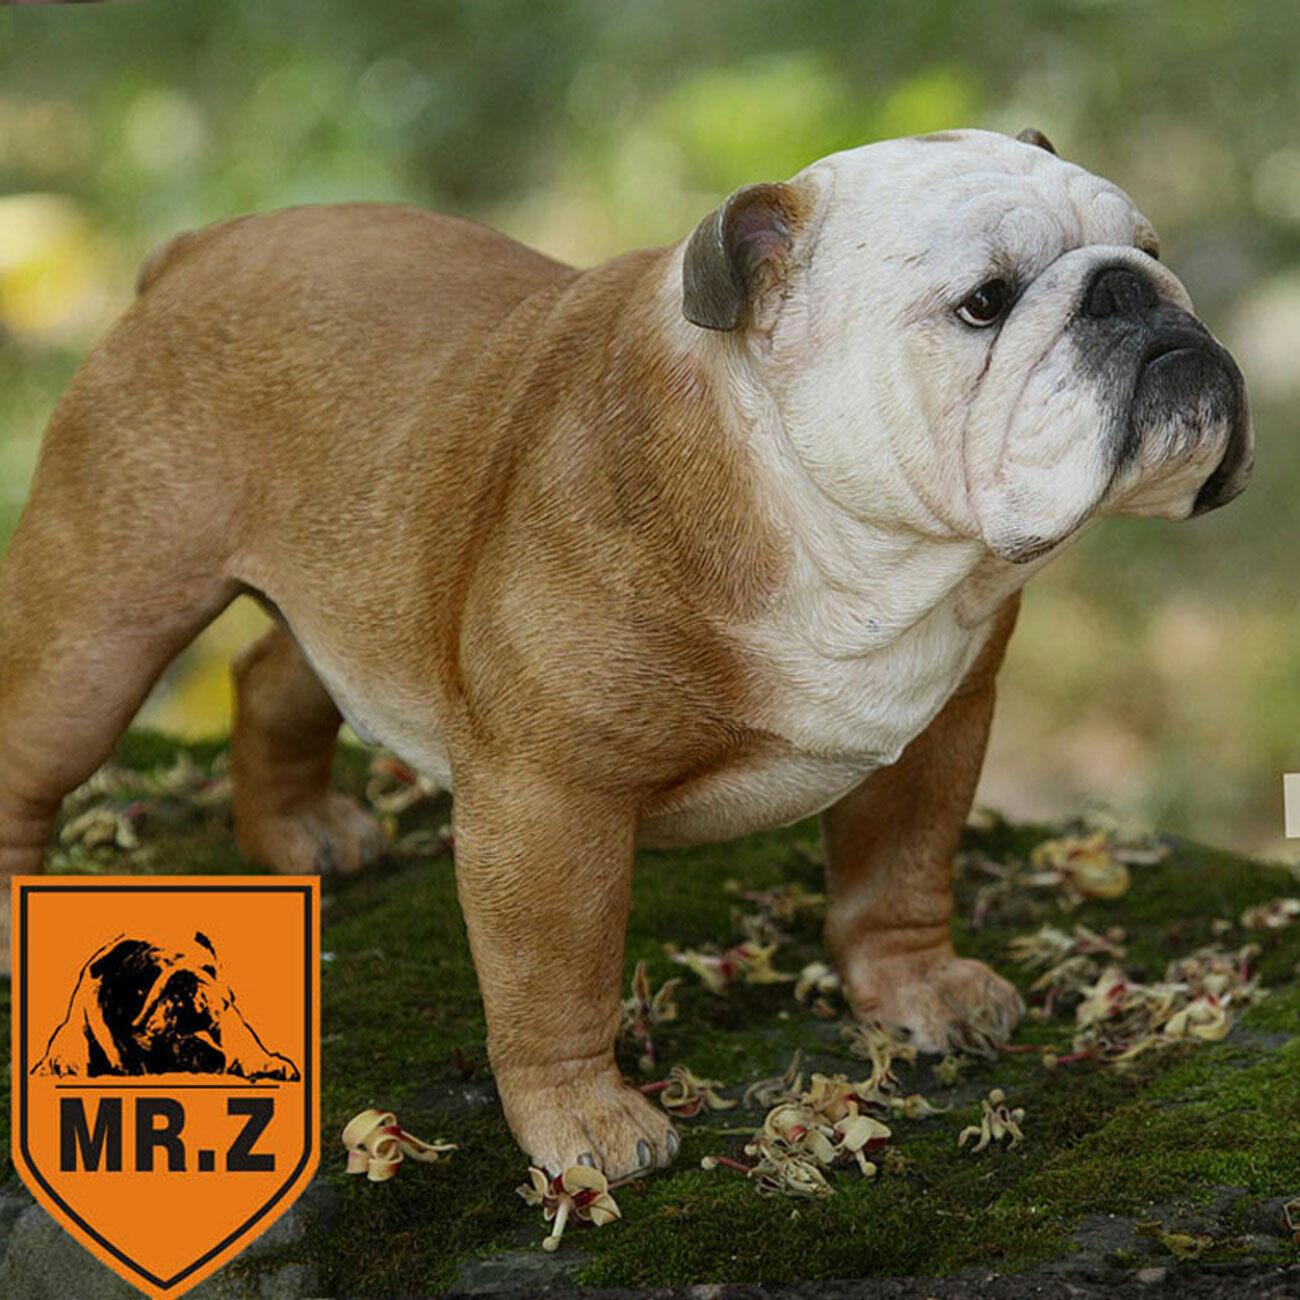 1 4th Mr. Z Británico Bulldog simulación de resina modelo de Decoración Figura De Acción Nueva